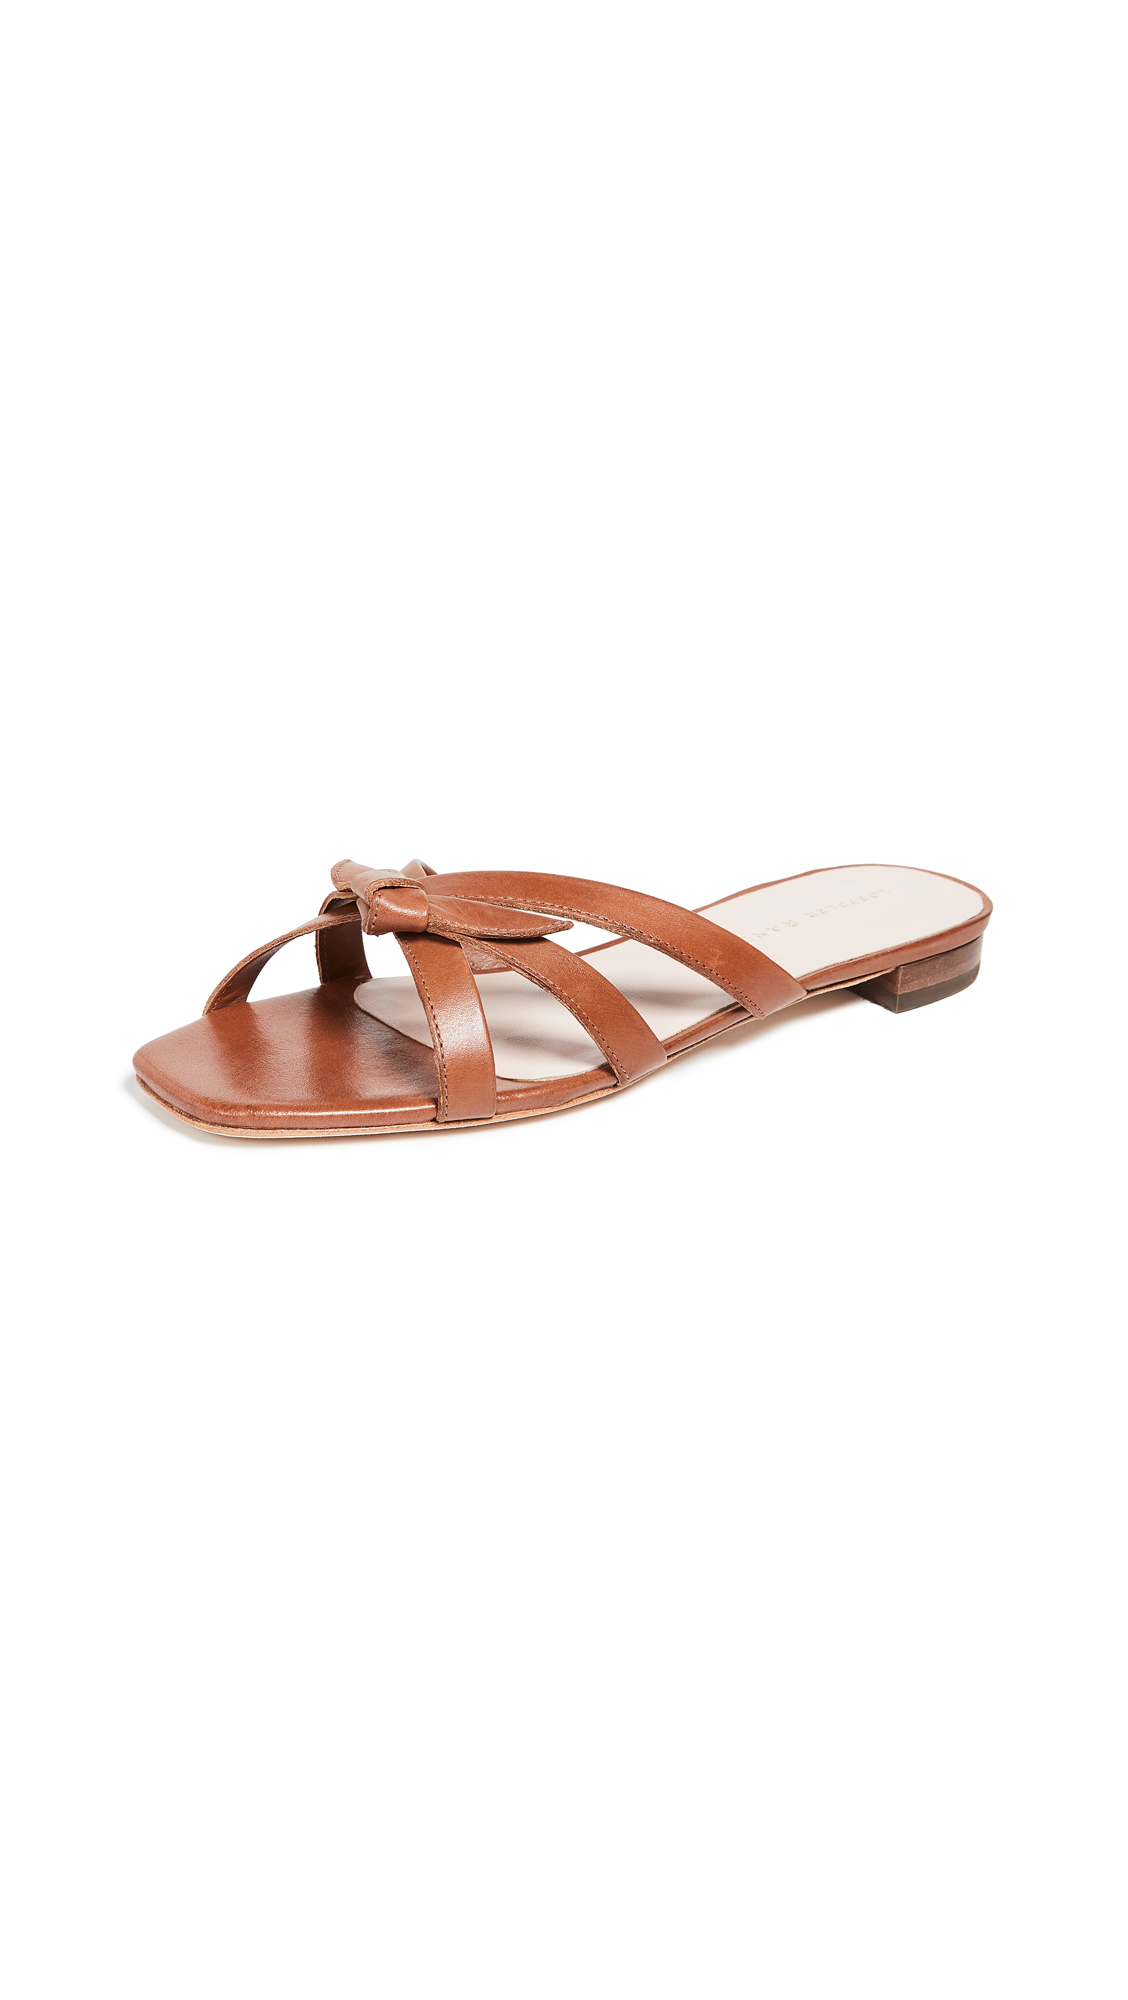 Buy Loeffler Randall online - photo of Loeffler Randall Eveline Delicate Strap Flat Sandals